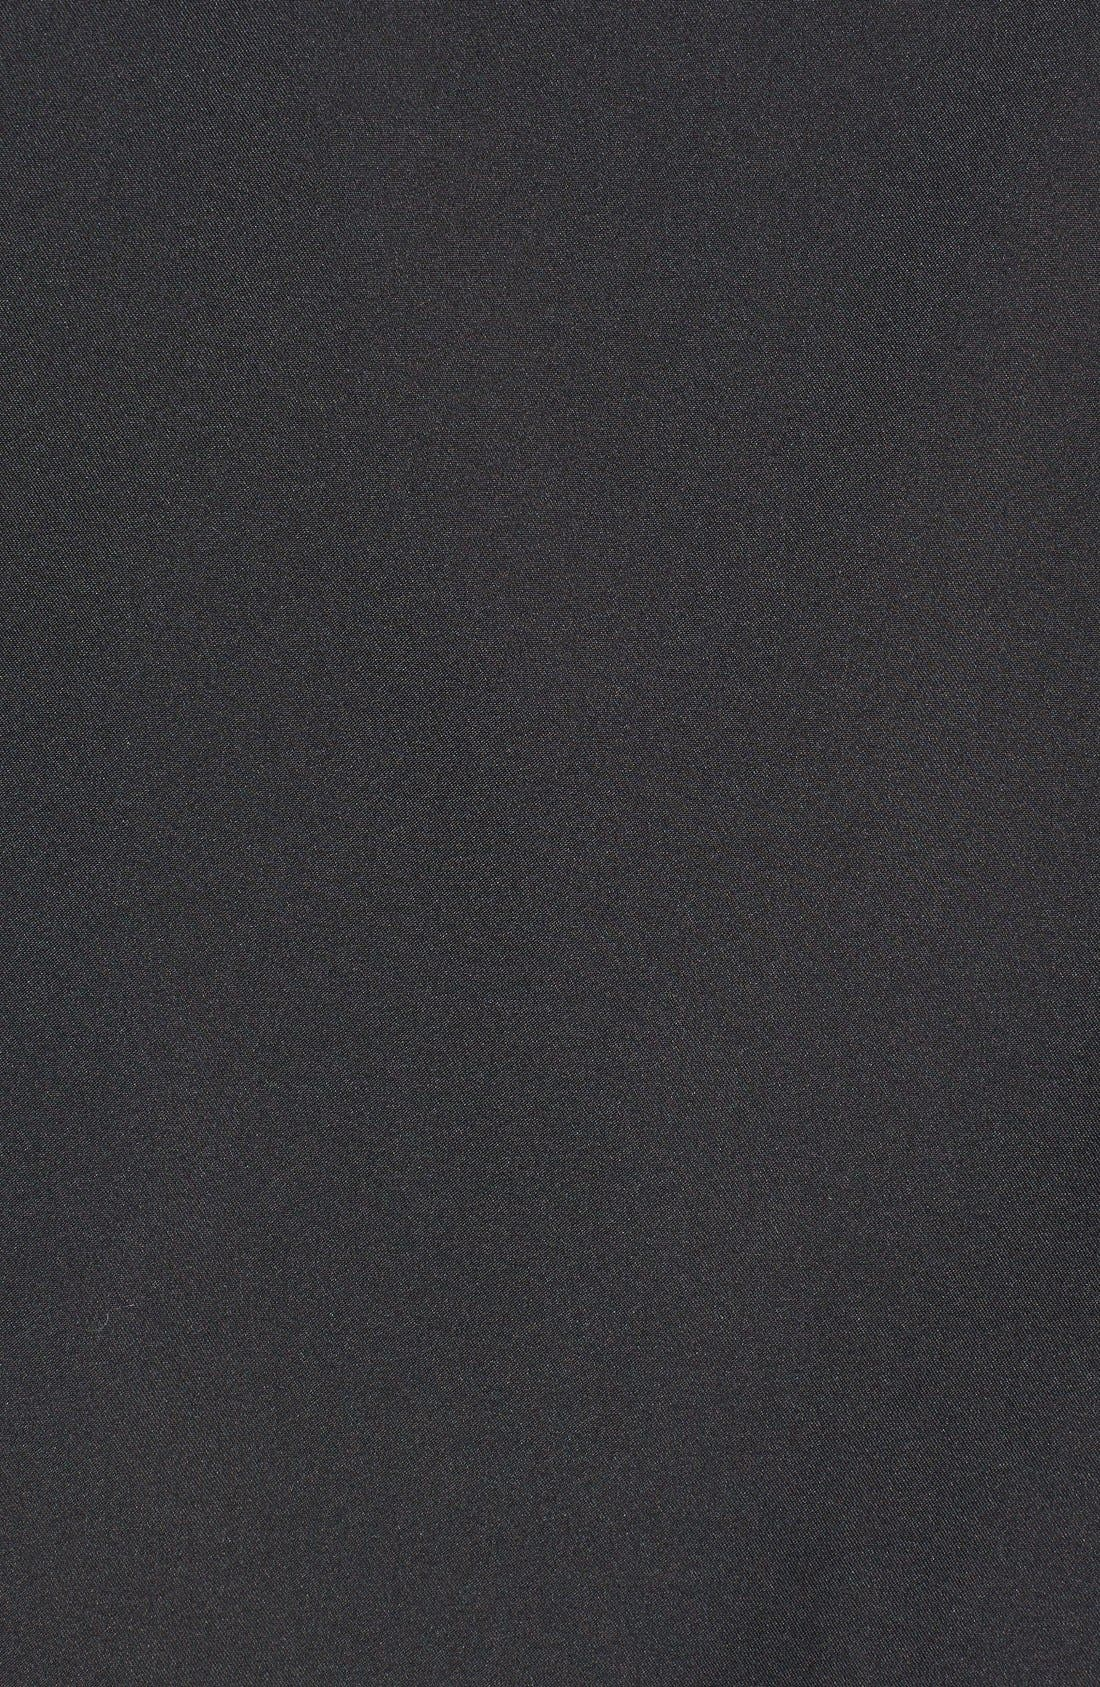 New Orleans Saints - Beacon WeatherTec Wind & Water Resistant Jacket,                             Alternate thumbnail 3, color,                             Black